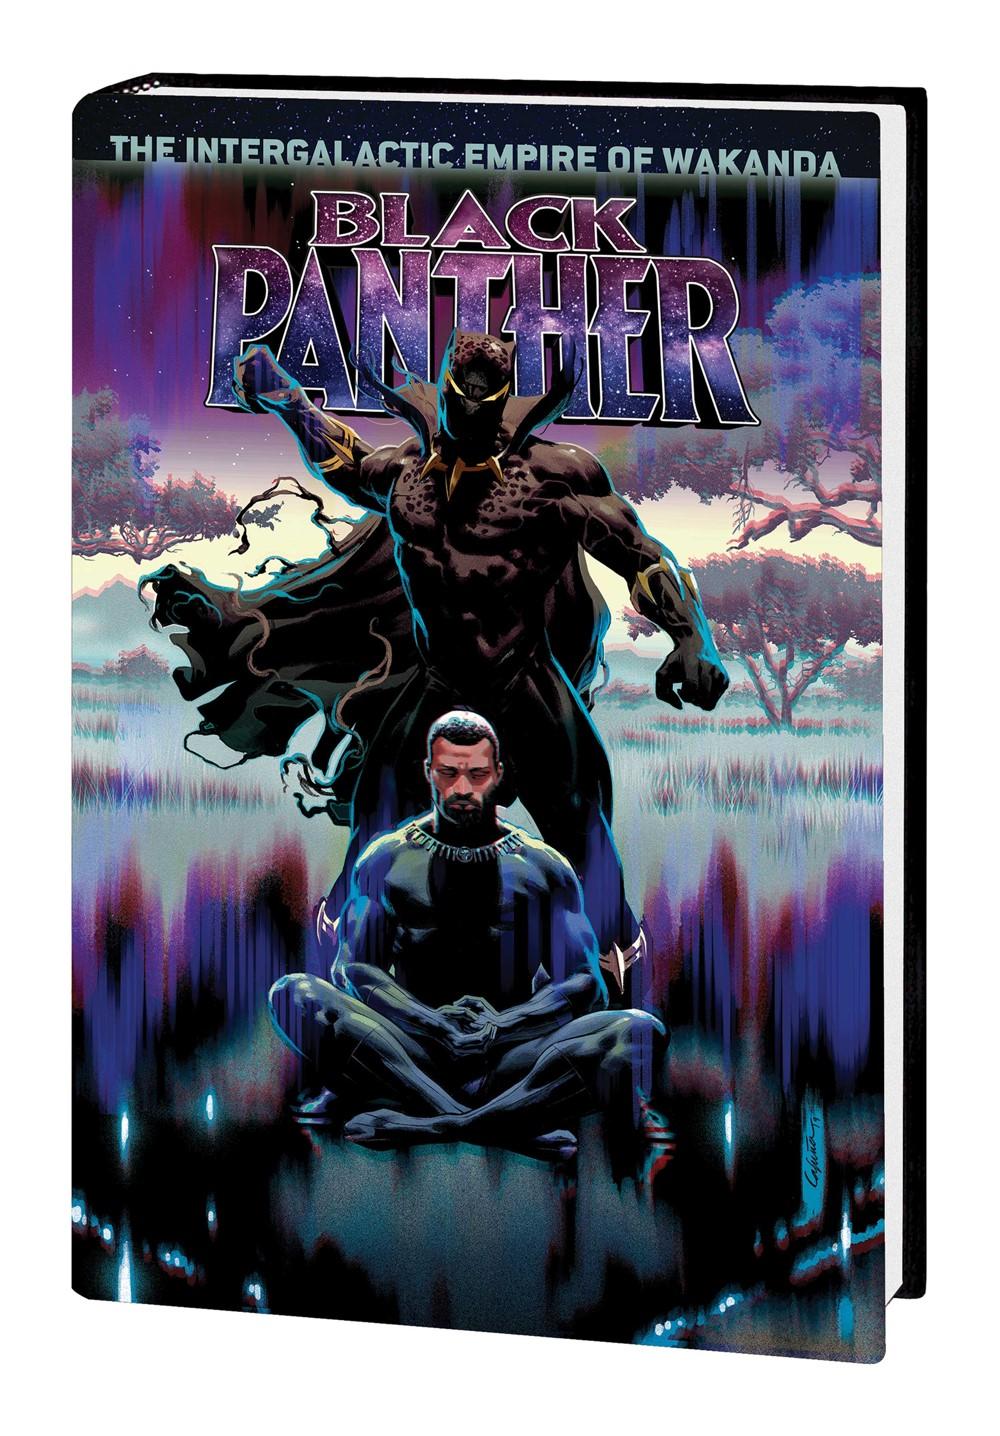 BLACK_PANTHER_VOL_4_P2_HC Marvel Comics September 2021 Solicitations